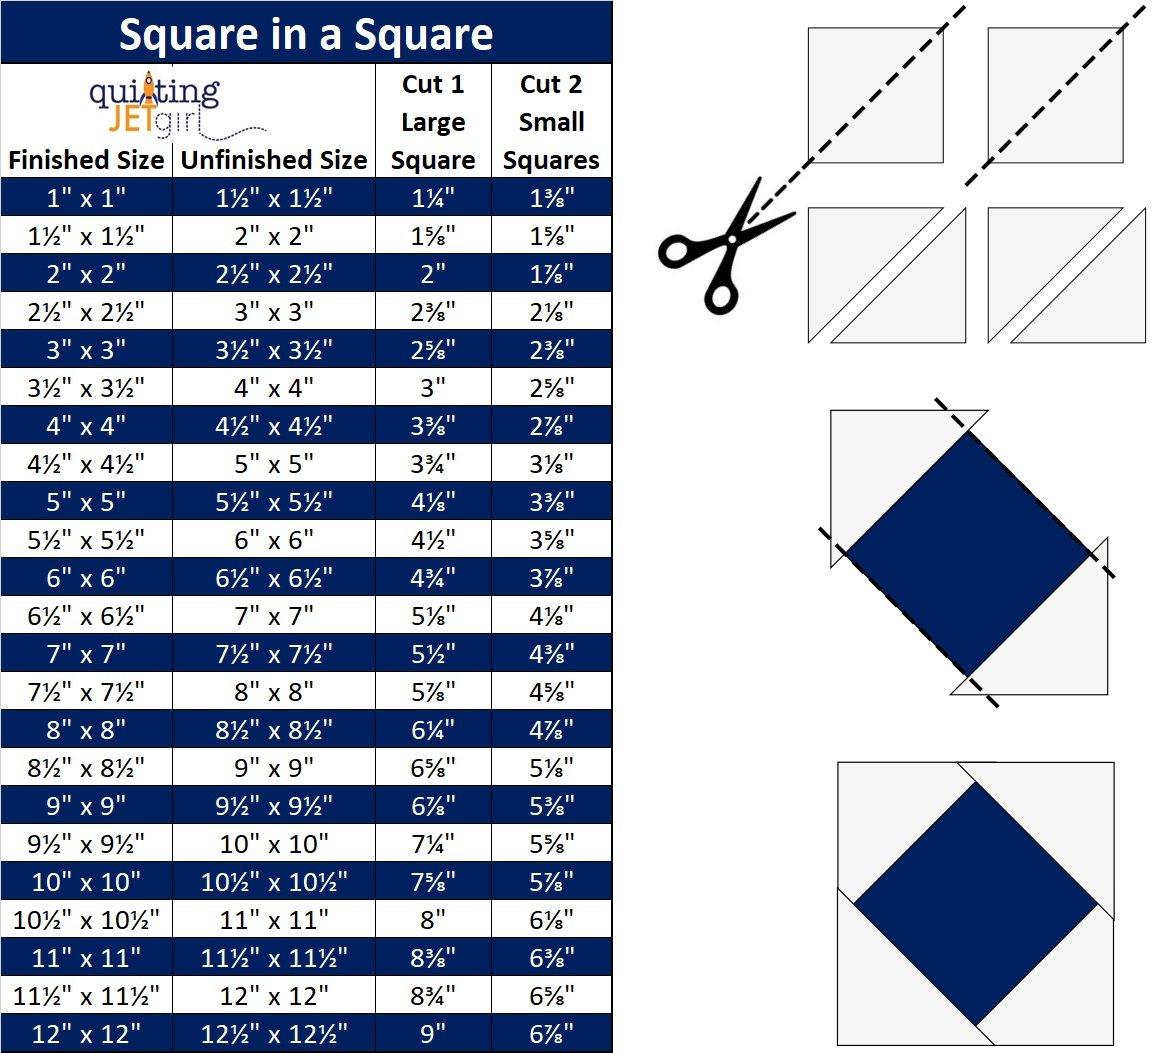 Square in a Square Table